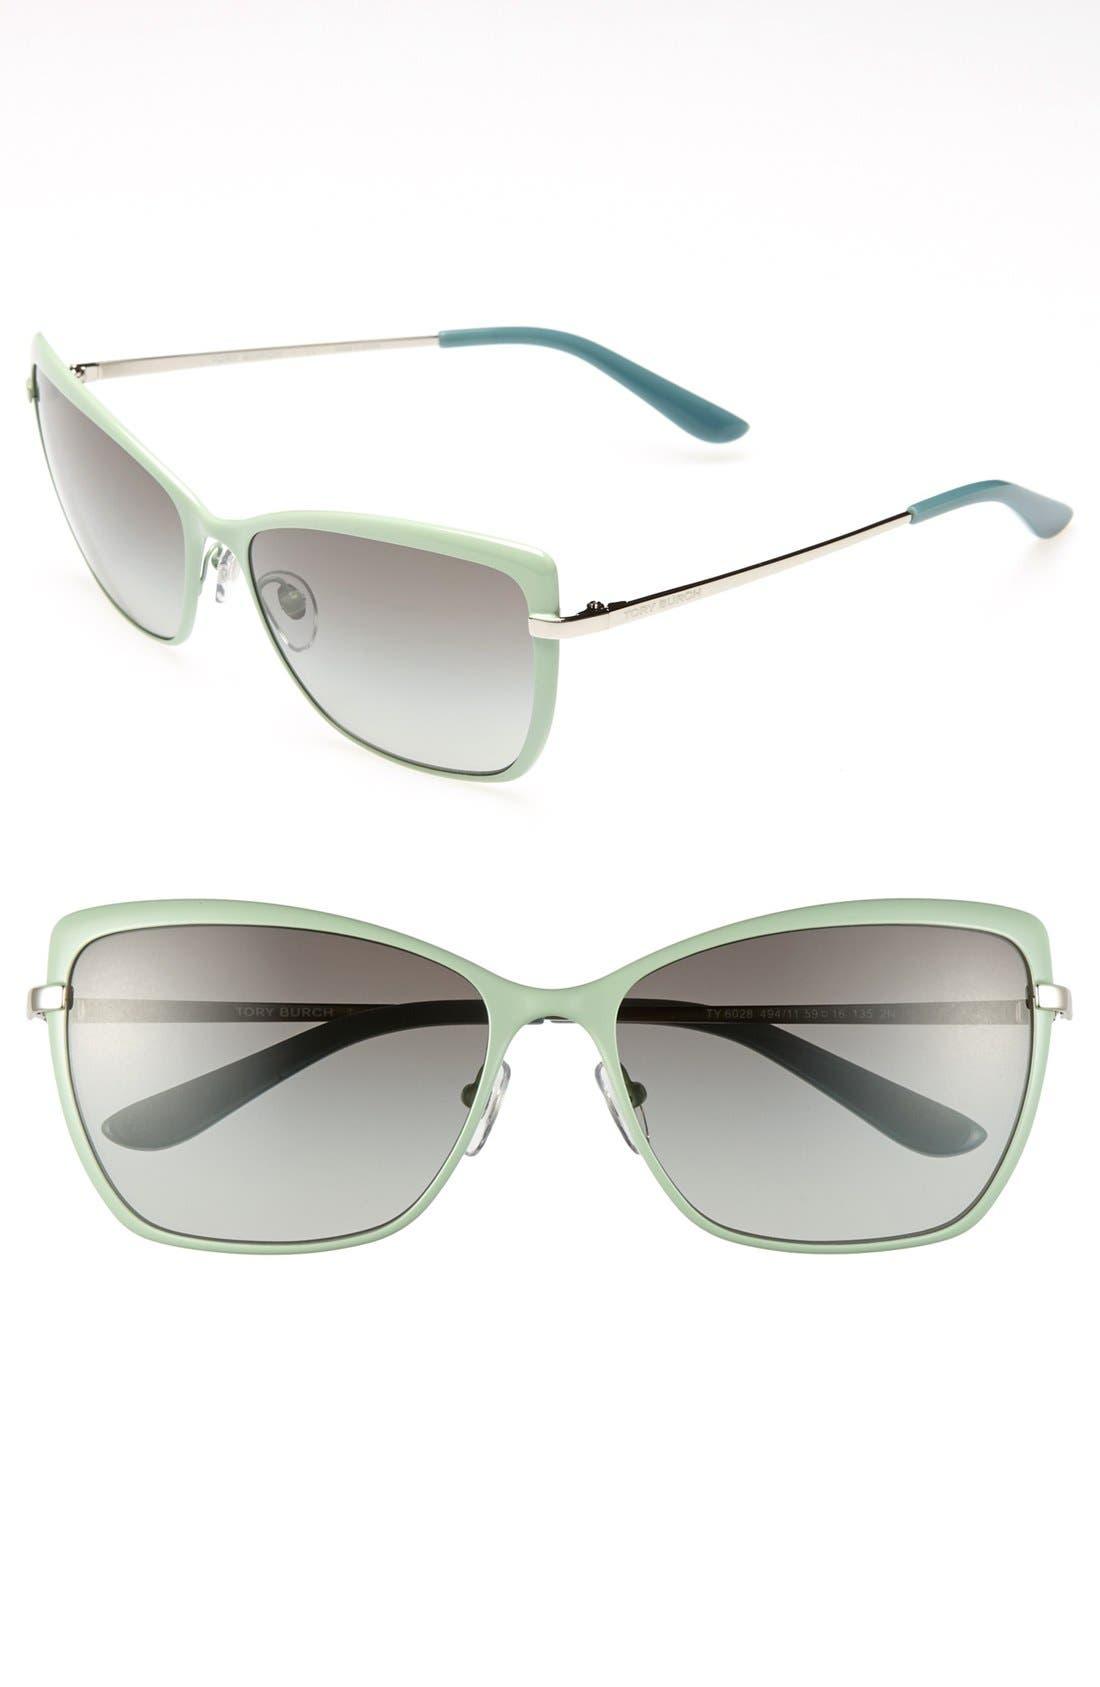 Main Image - Tory Burch 59mm Retro Sunglasses